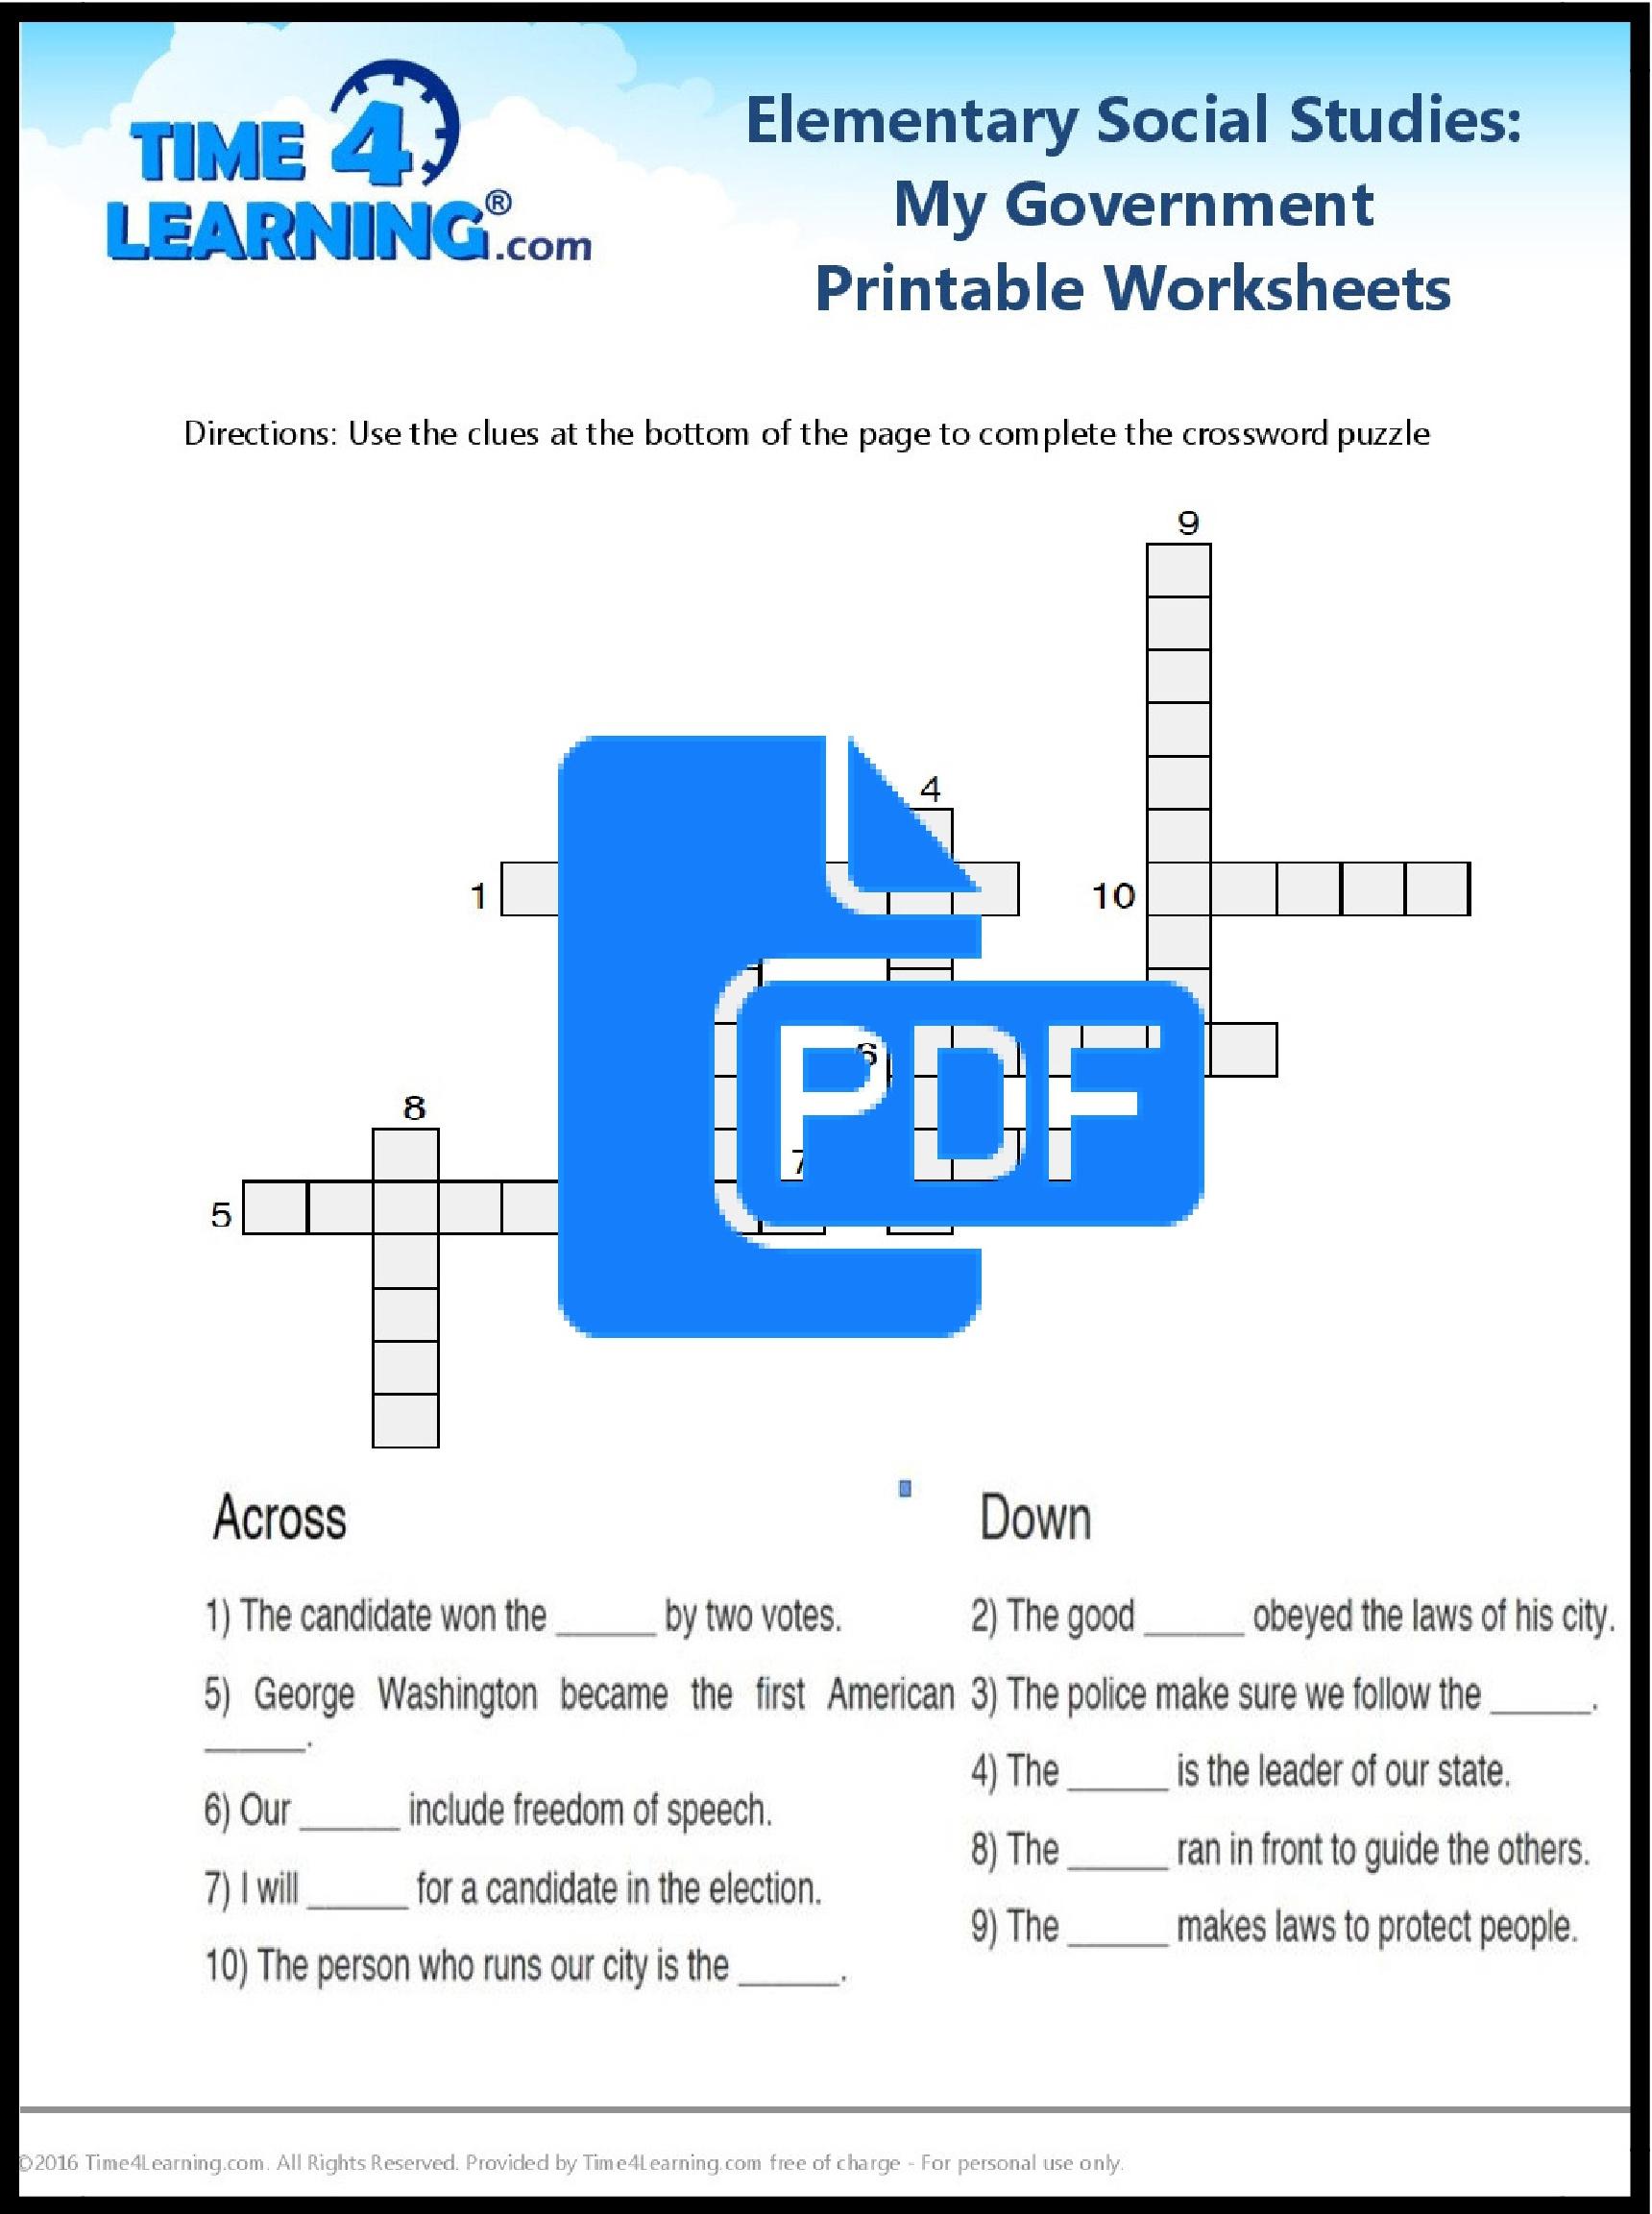 Free Printable: Elementary Social Studies Worksheet | Time4Learning | Printable Social Studies Worksheets 8Th Grade